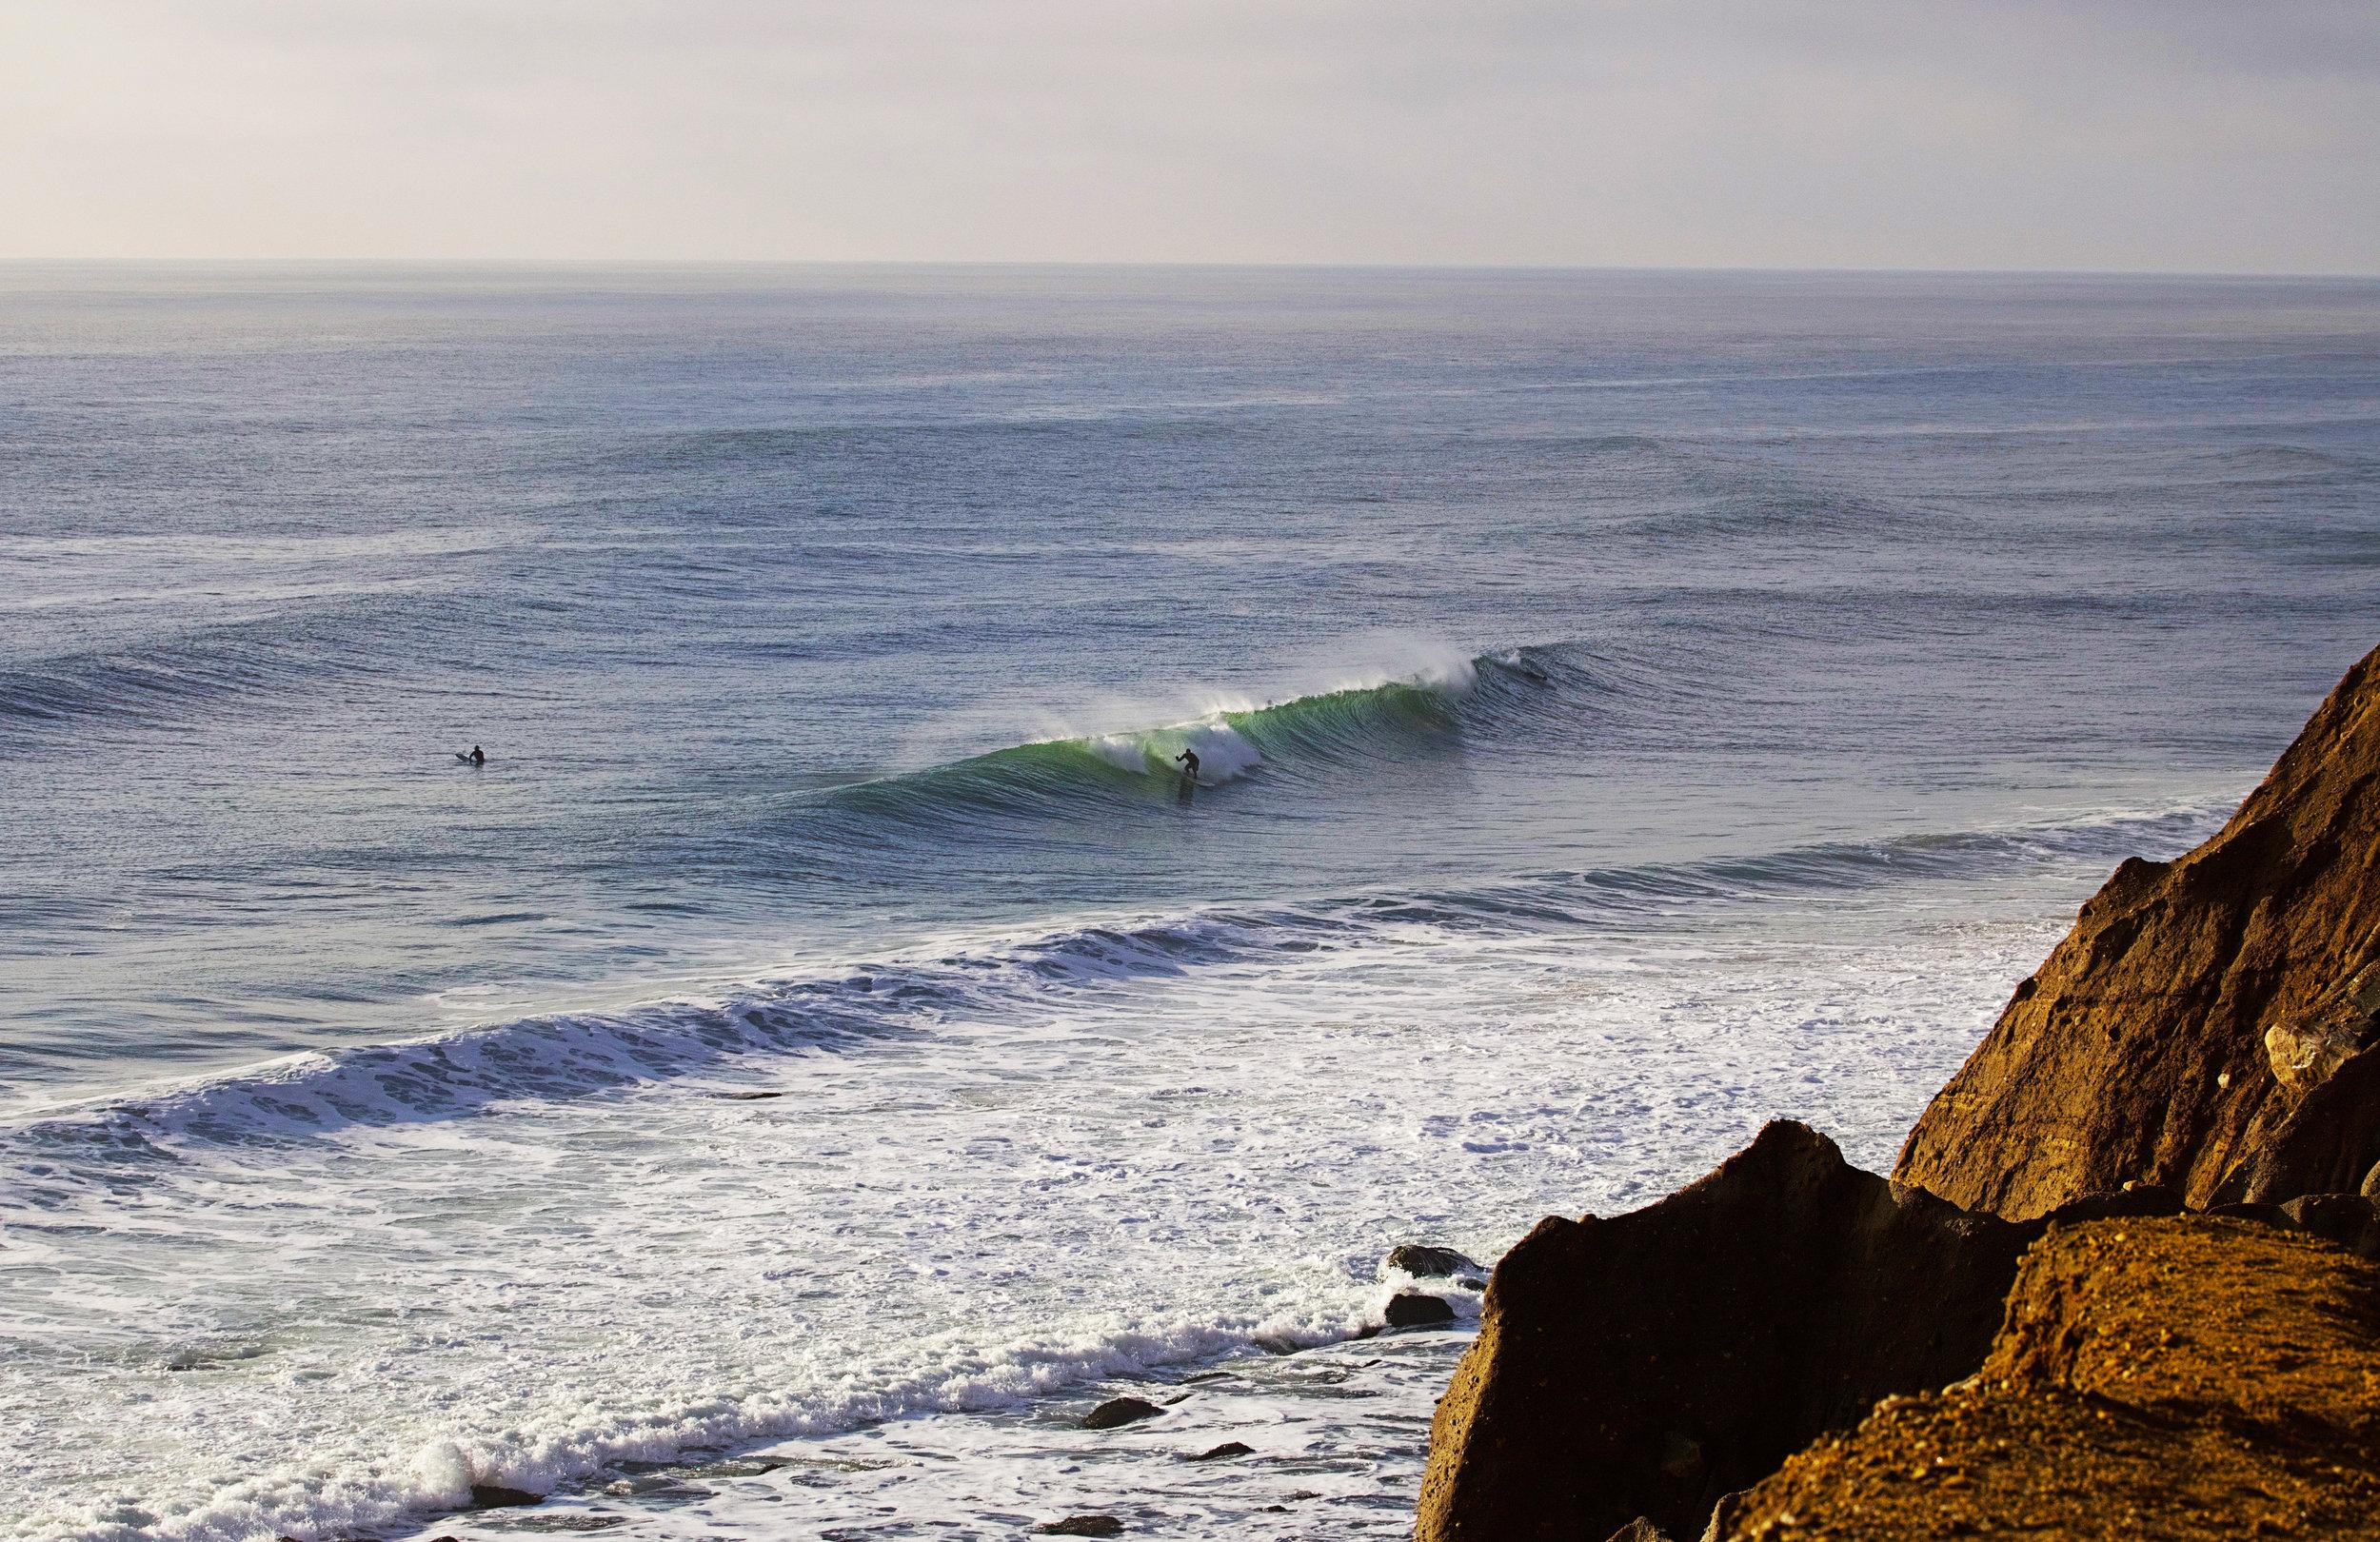 1-19-17 MTK Surfer 8.jpg